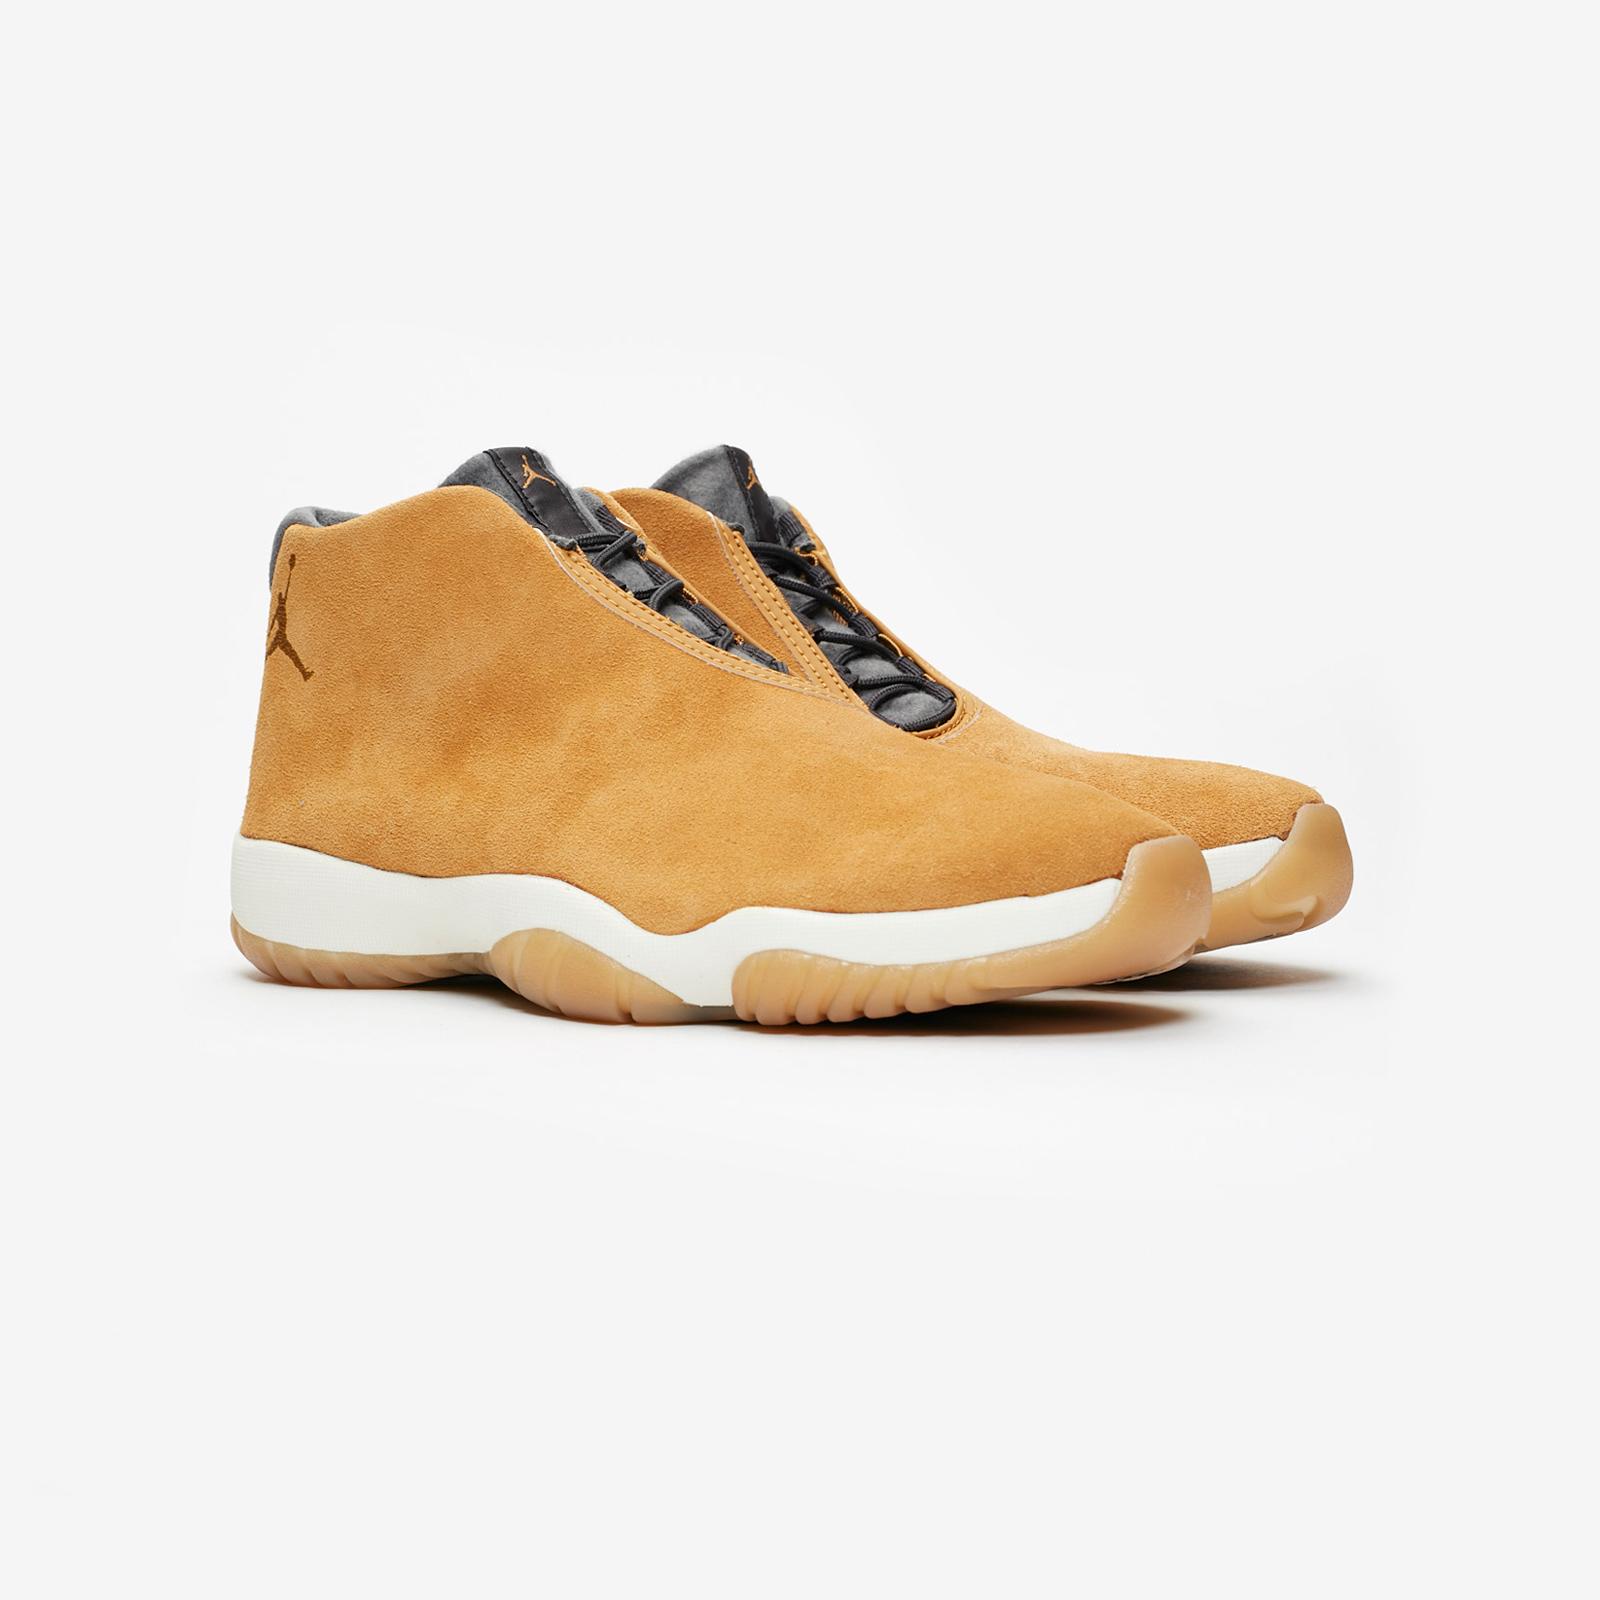 a6a822f30d6d4c Jordan Brand Air Jordan Future - Av7008-700 - Sneakersnstuff ...